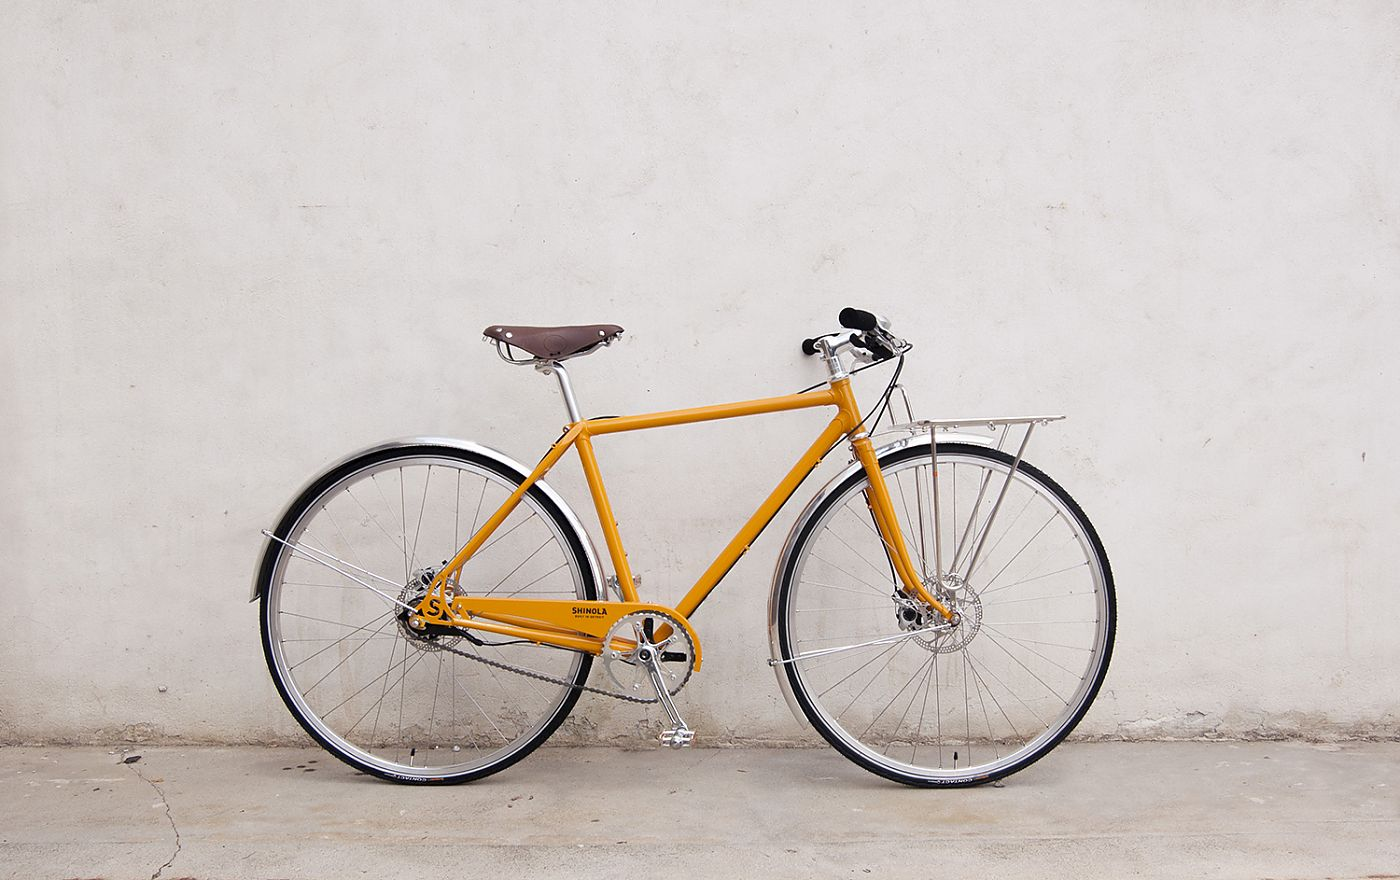 Detroit Startup Shinola Hires Sky Yaeger To Develop City Bikes